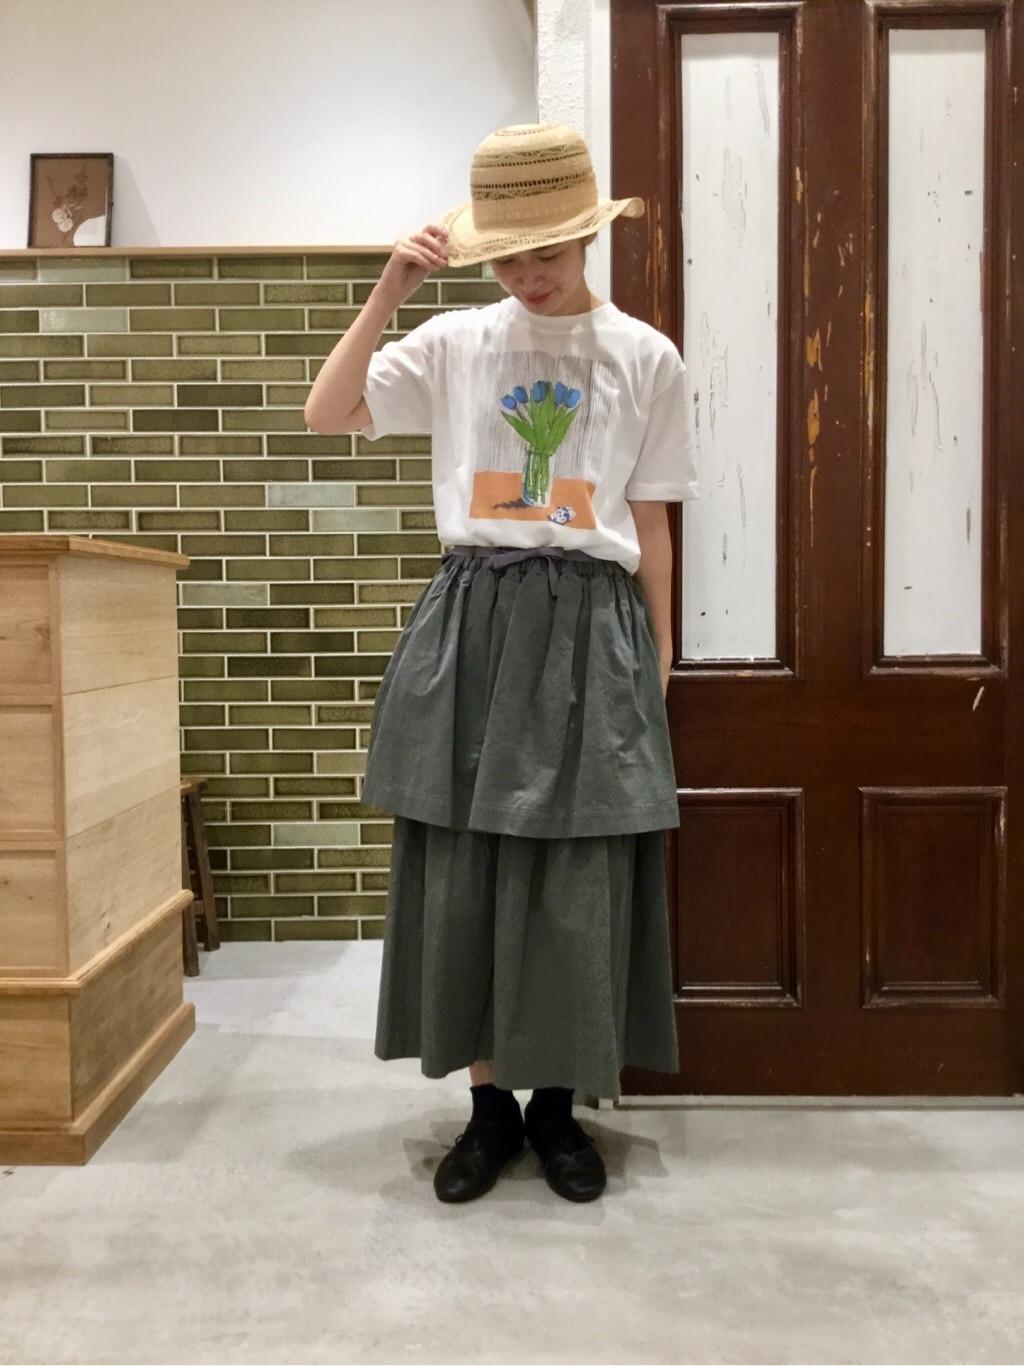 chambre de charme 横浜ジョイナス 身長:160cm 2020.06.17